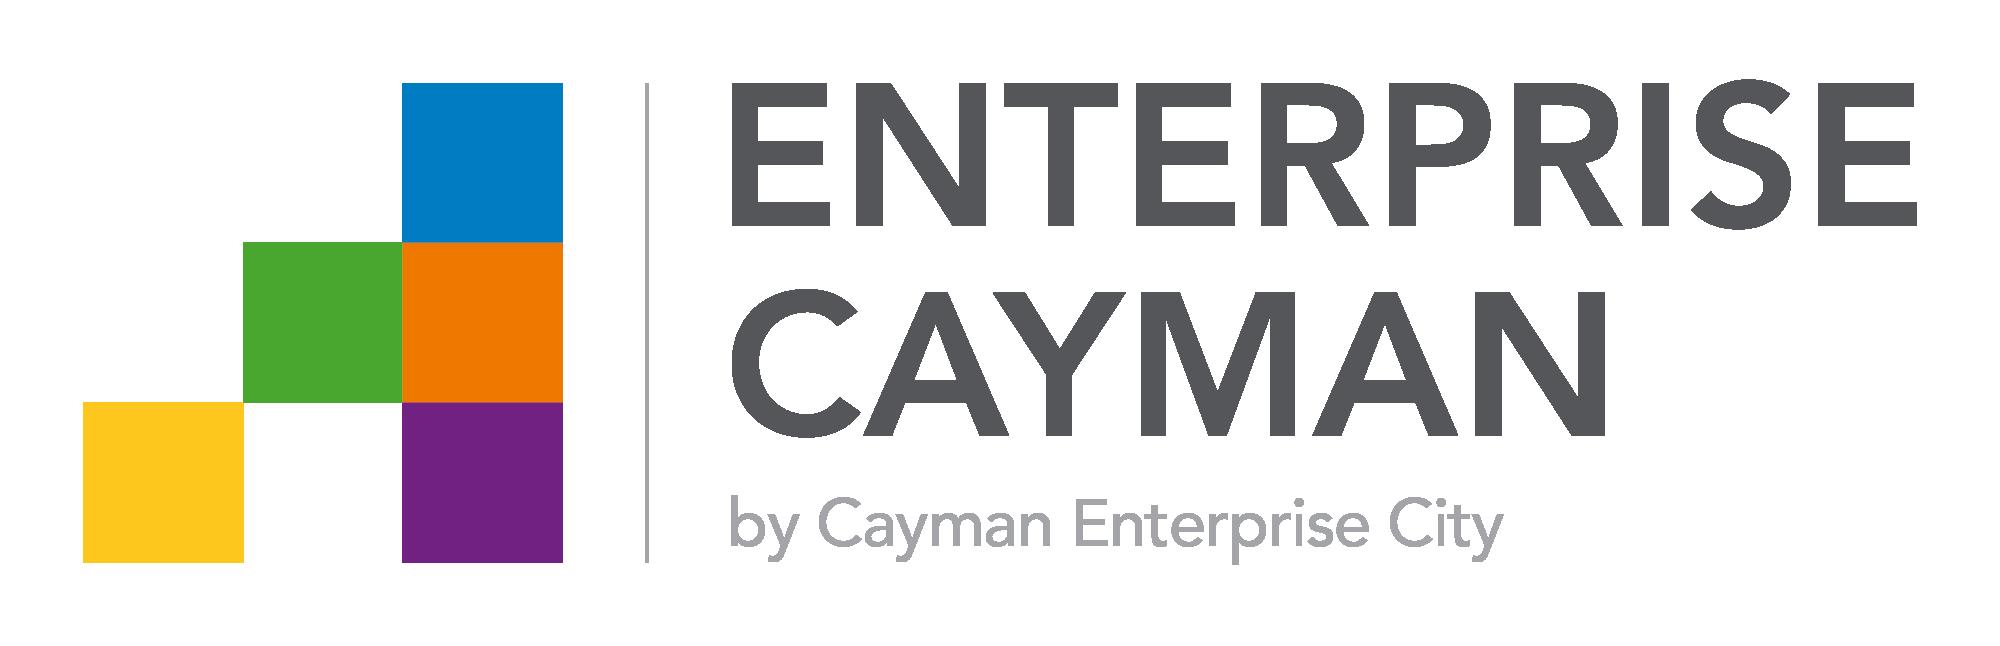 EC_Final Logos_Enterprise Cayman - Full Colour_1